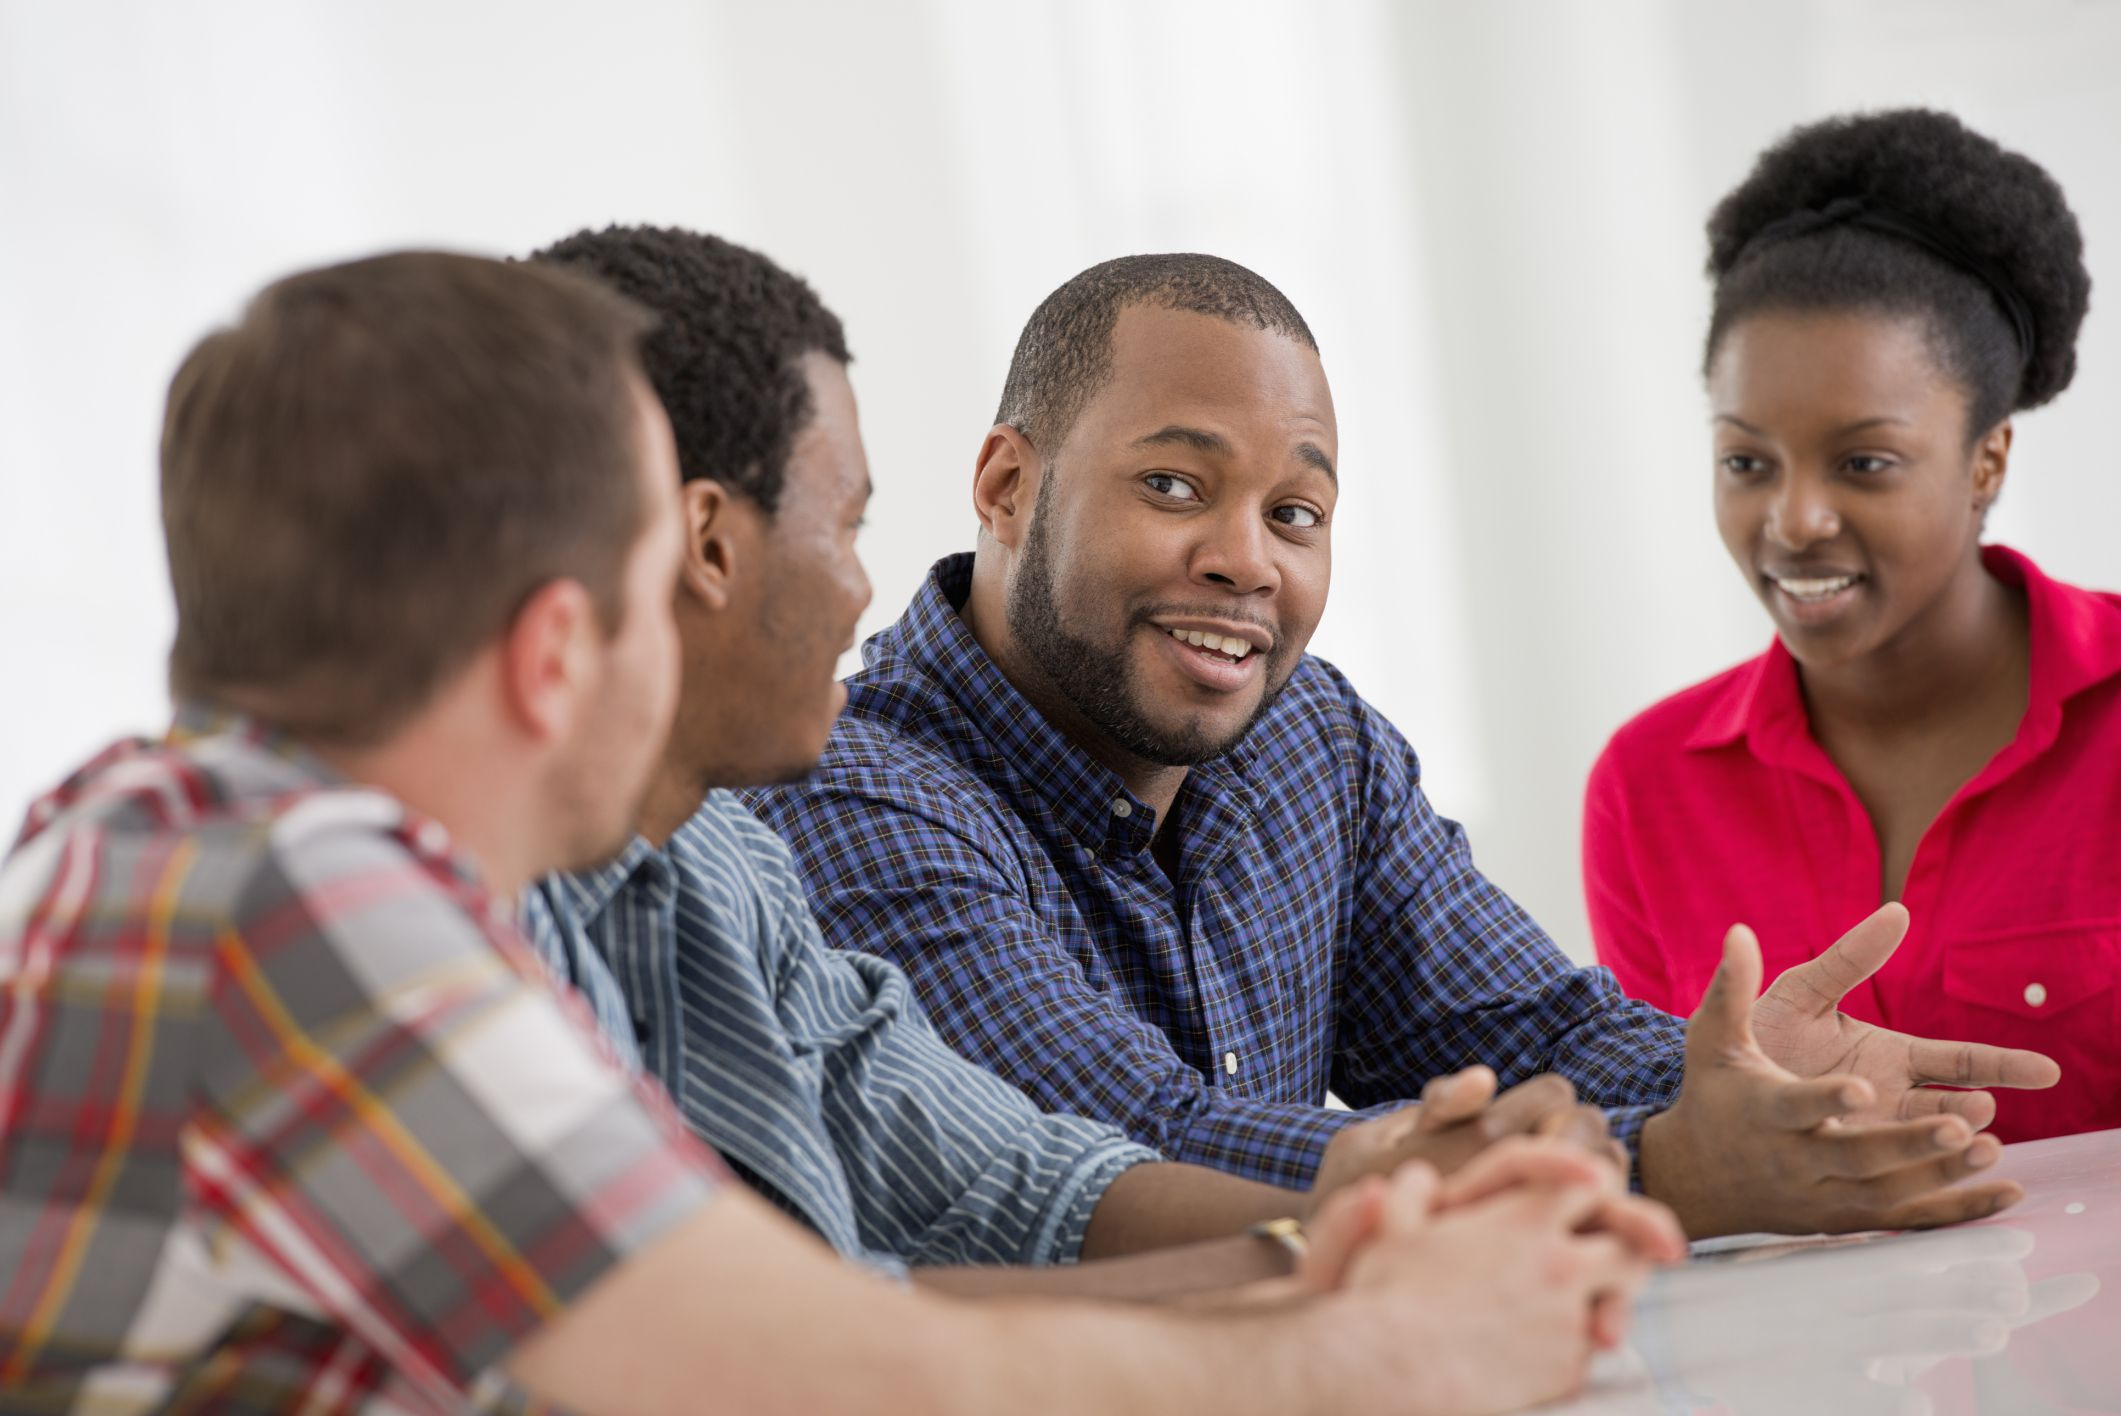 Team Building Activity Sharing Management Wisdom